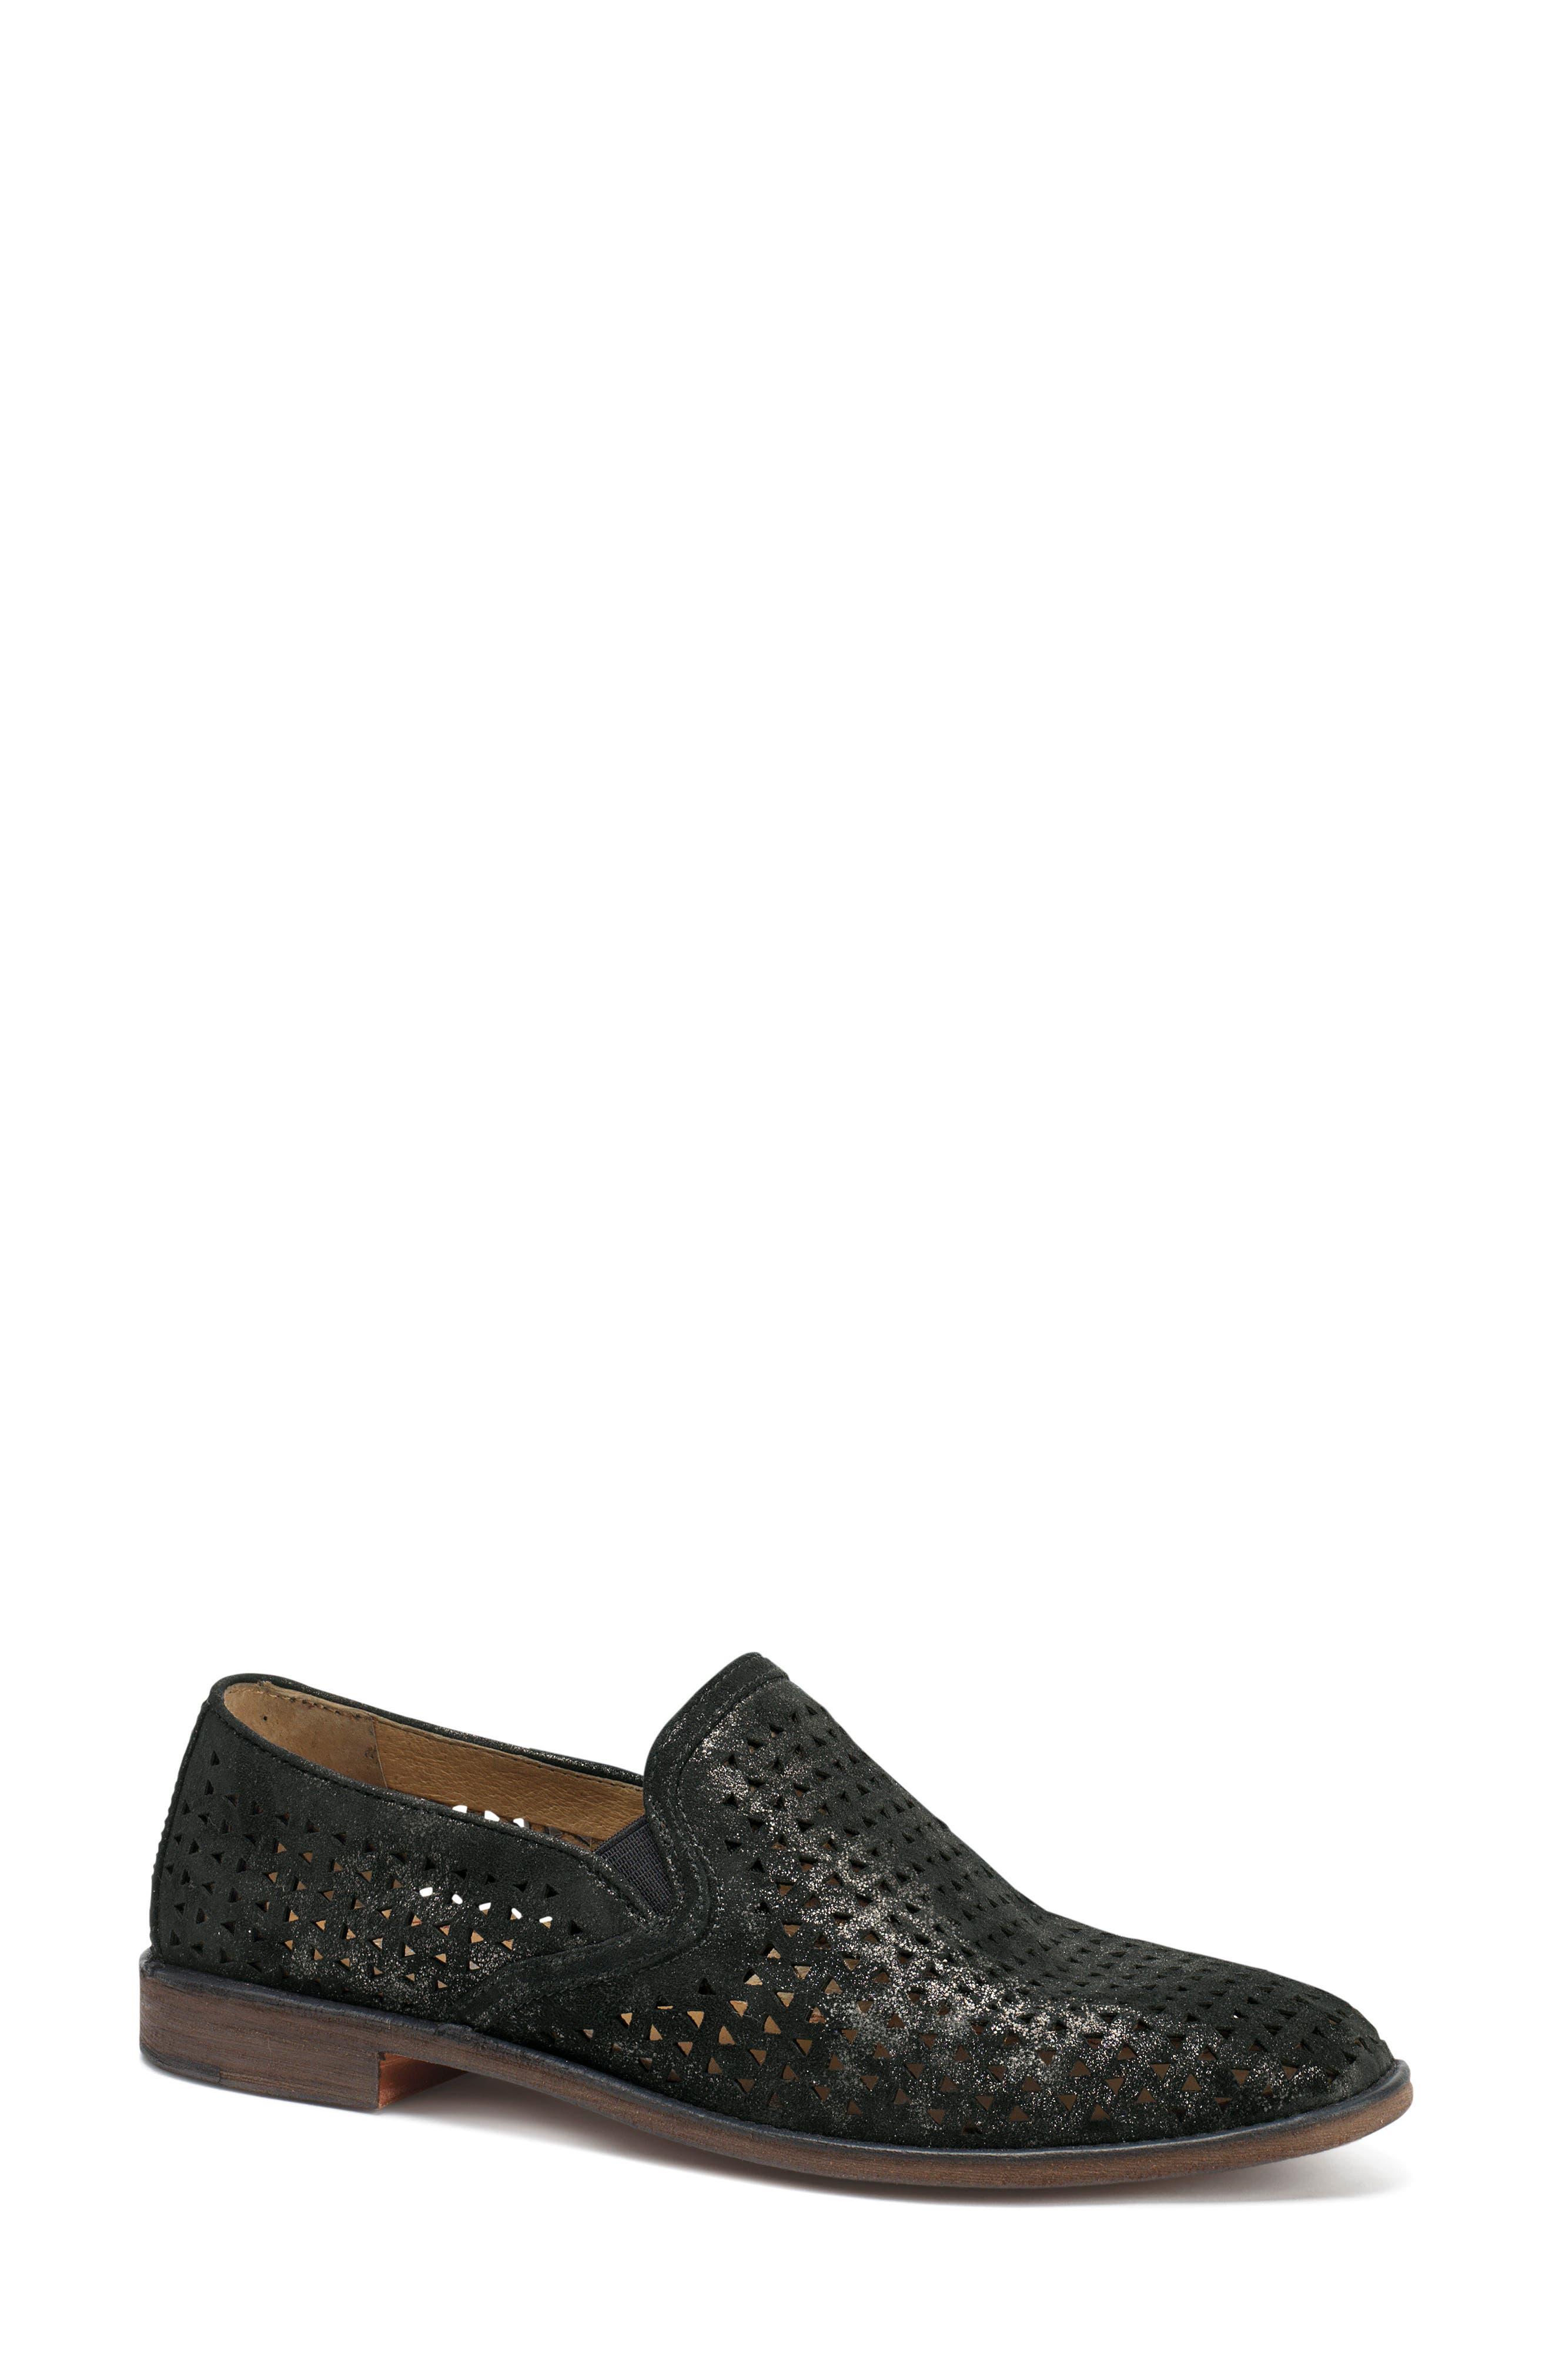 Trask Ali Perforated Loafer- Black